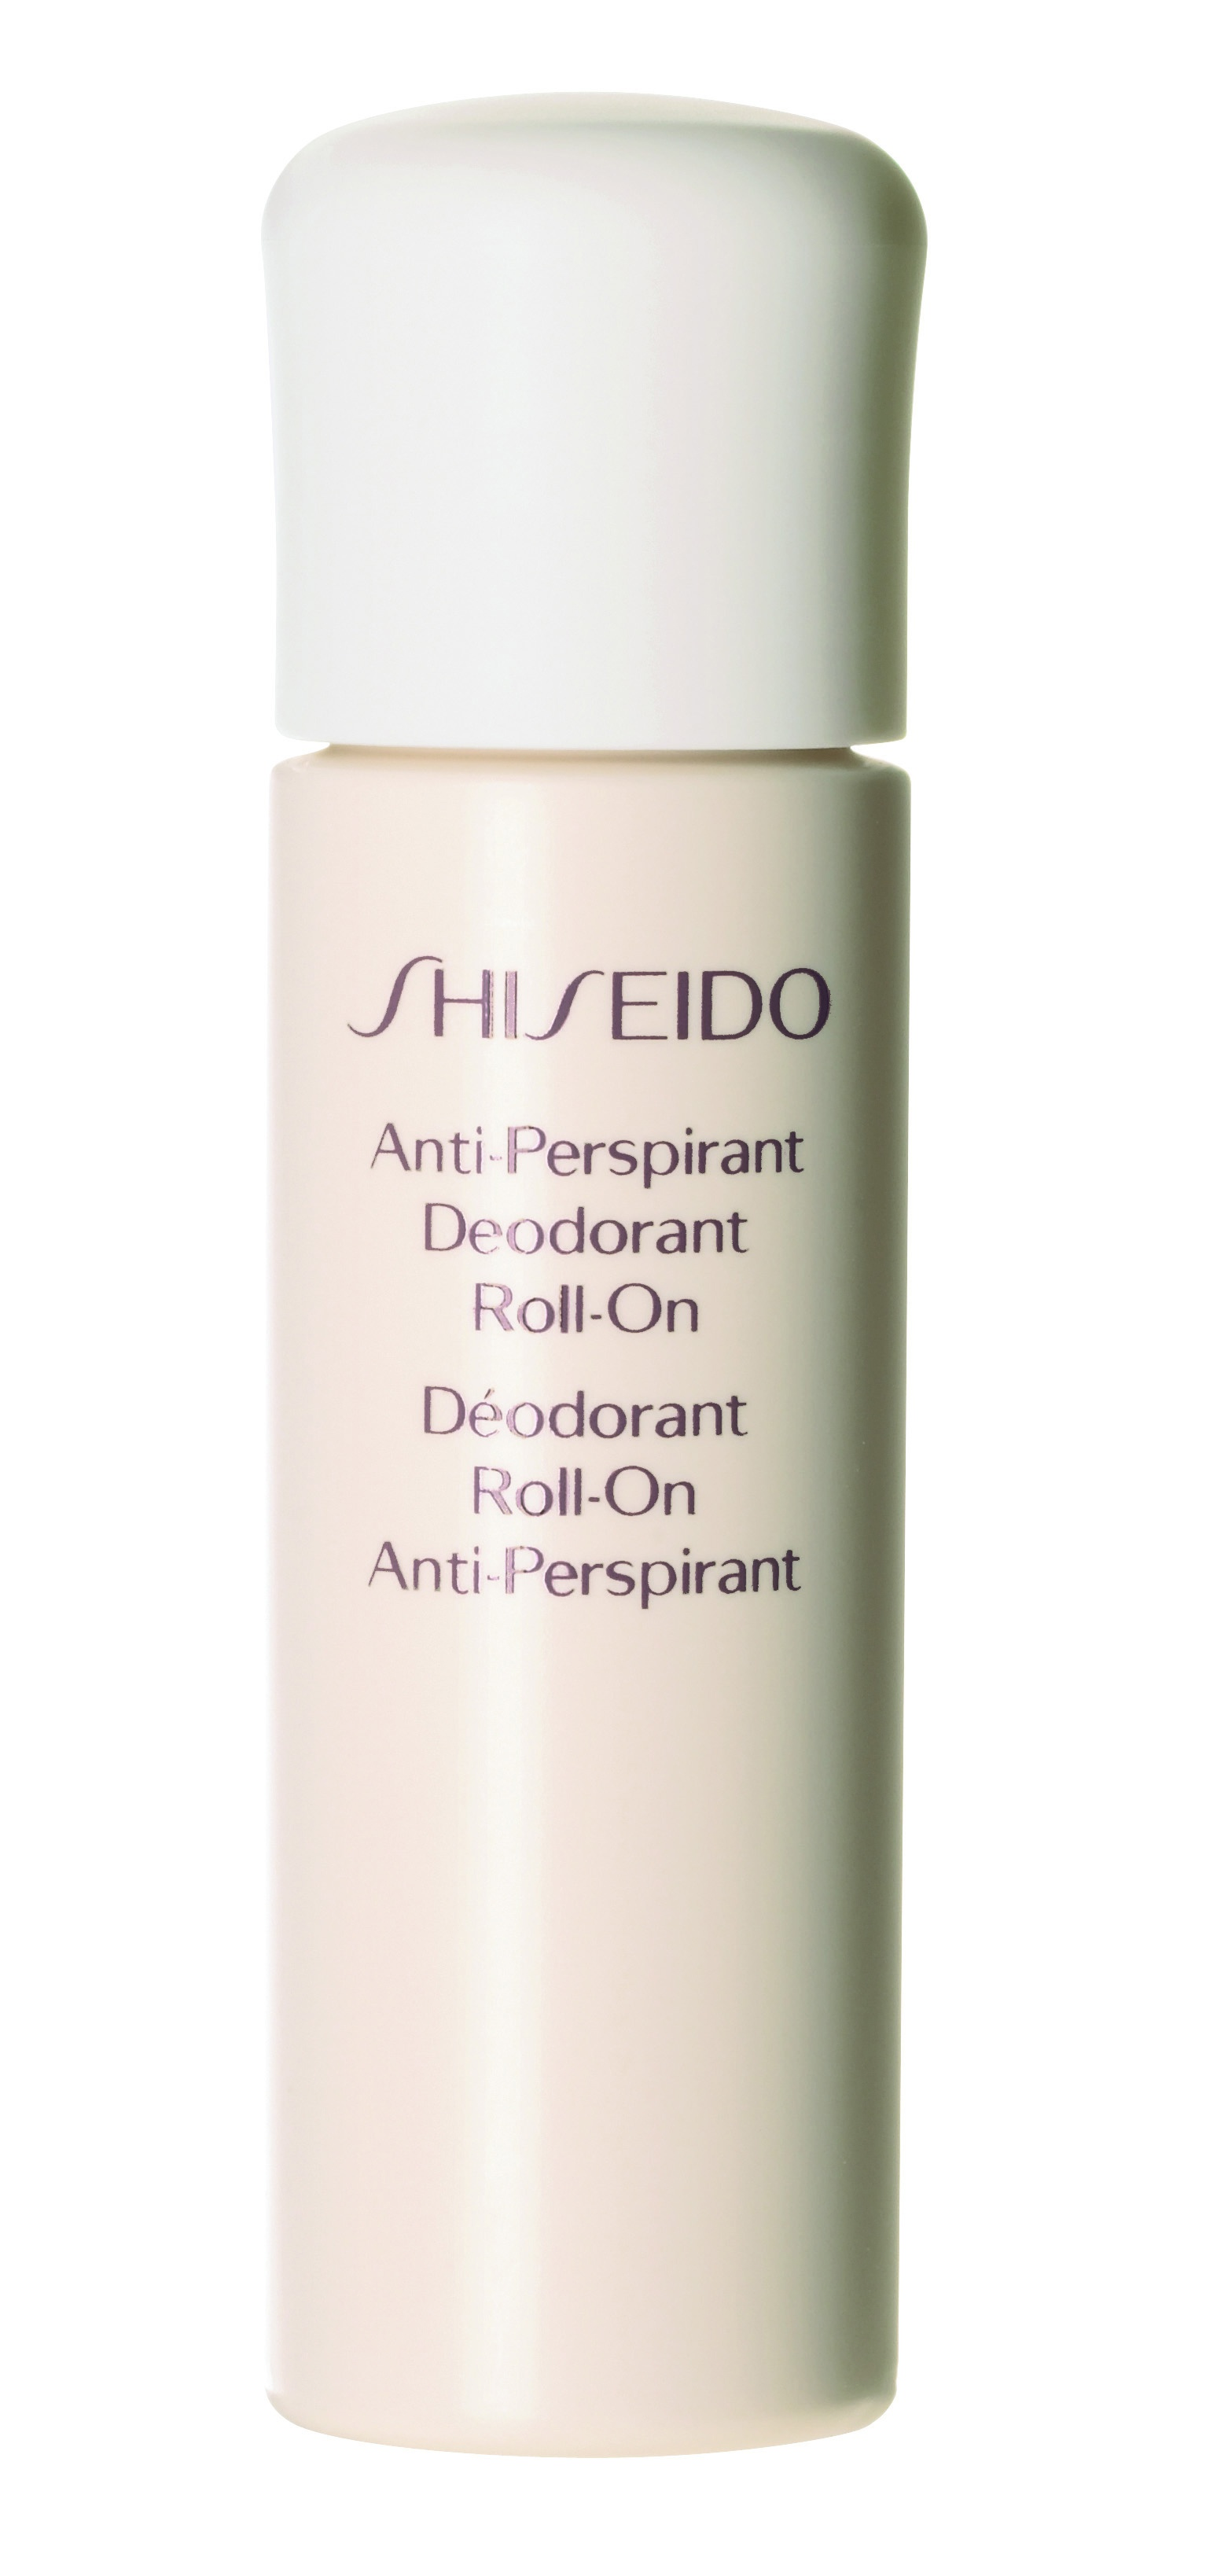 Shiseido Anti-Perspirant Deodorant Roll-On, 50 ml